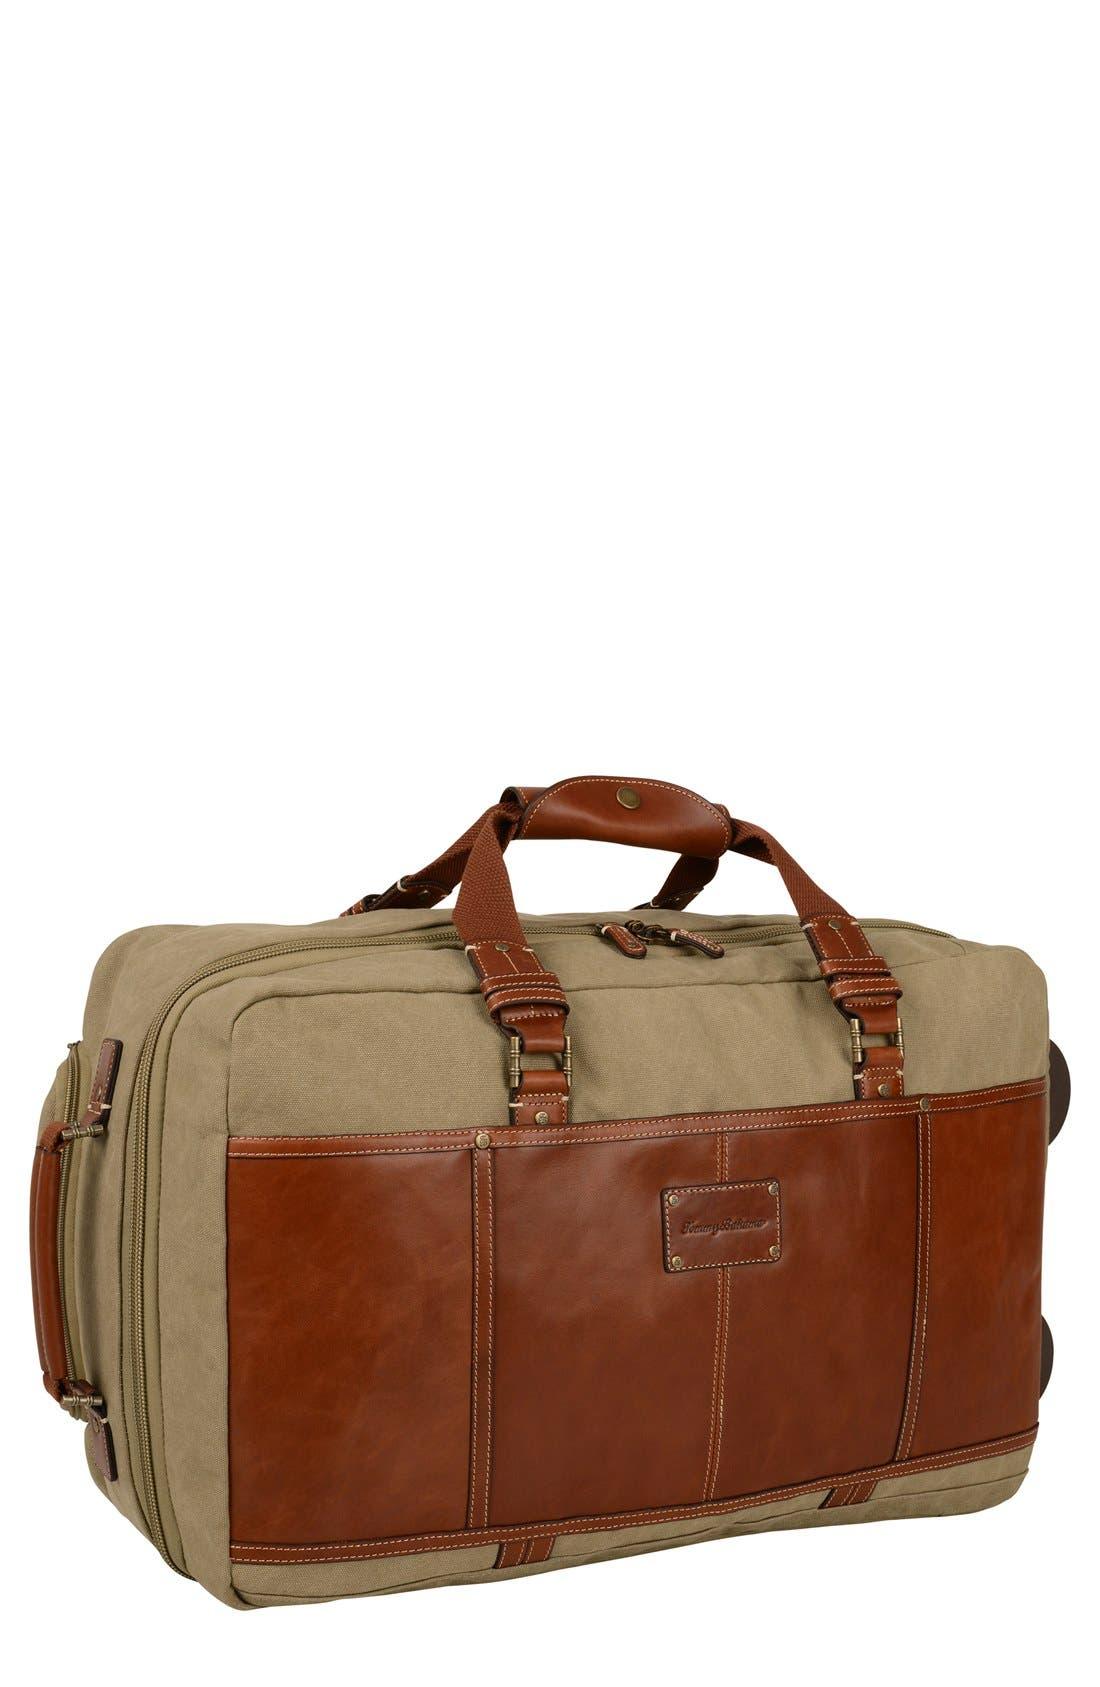 Tommy Bahama Canvas & Leather Wheeled Suitcase (24 inch)